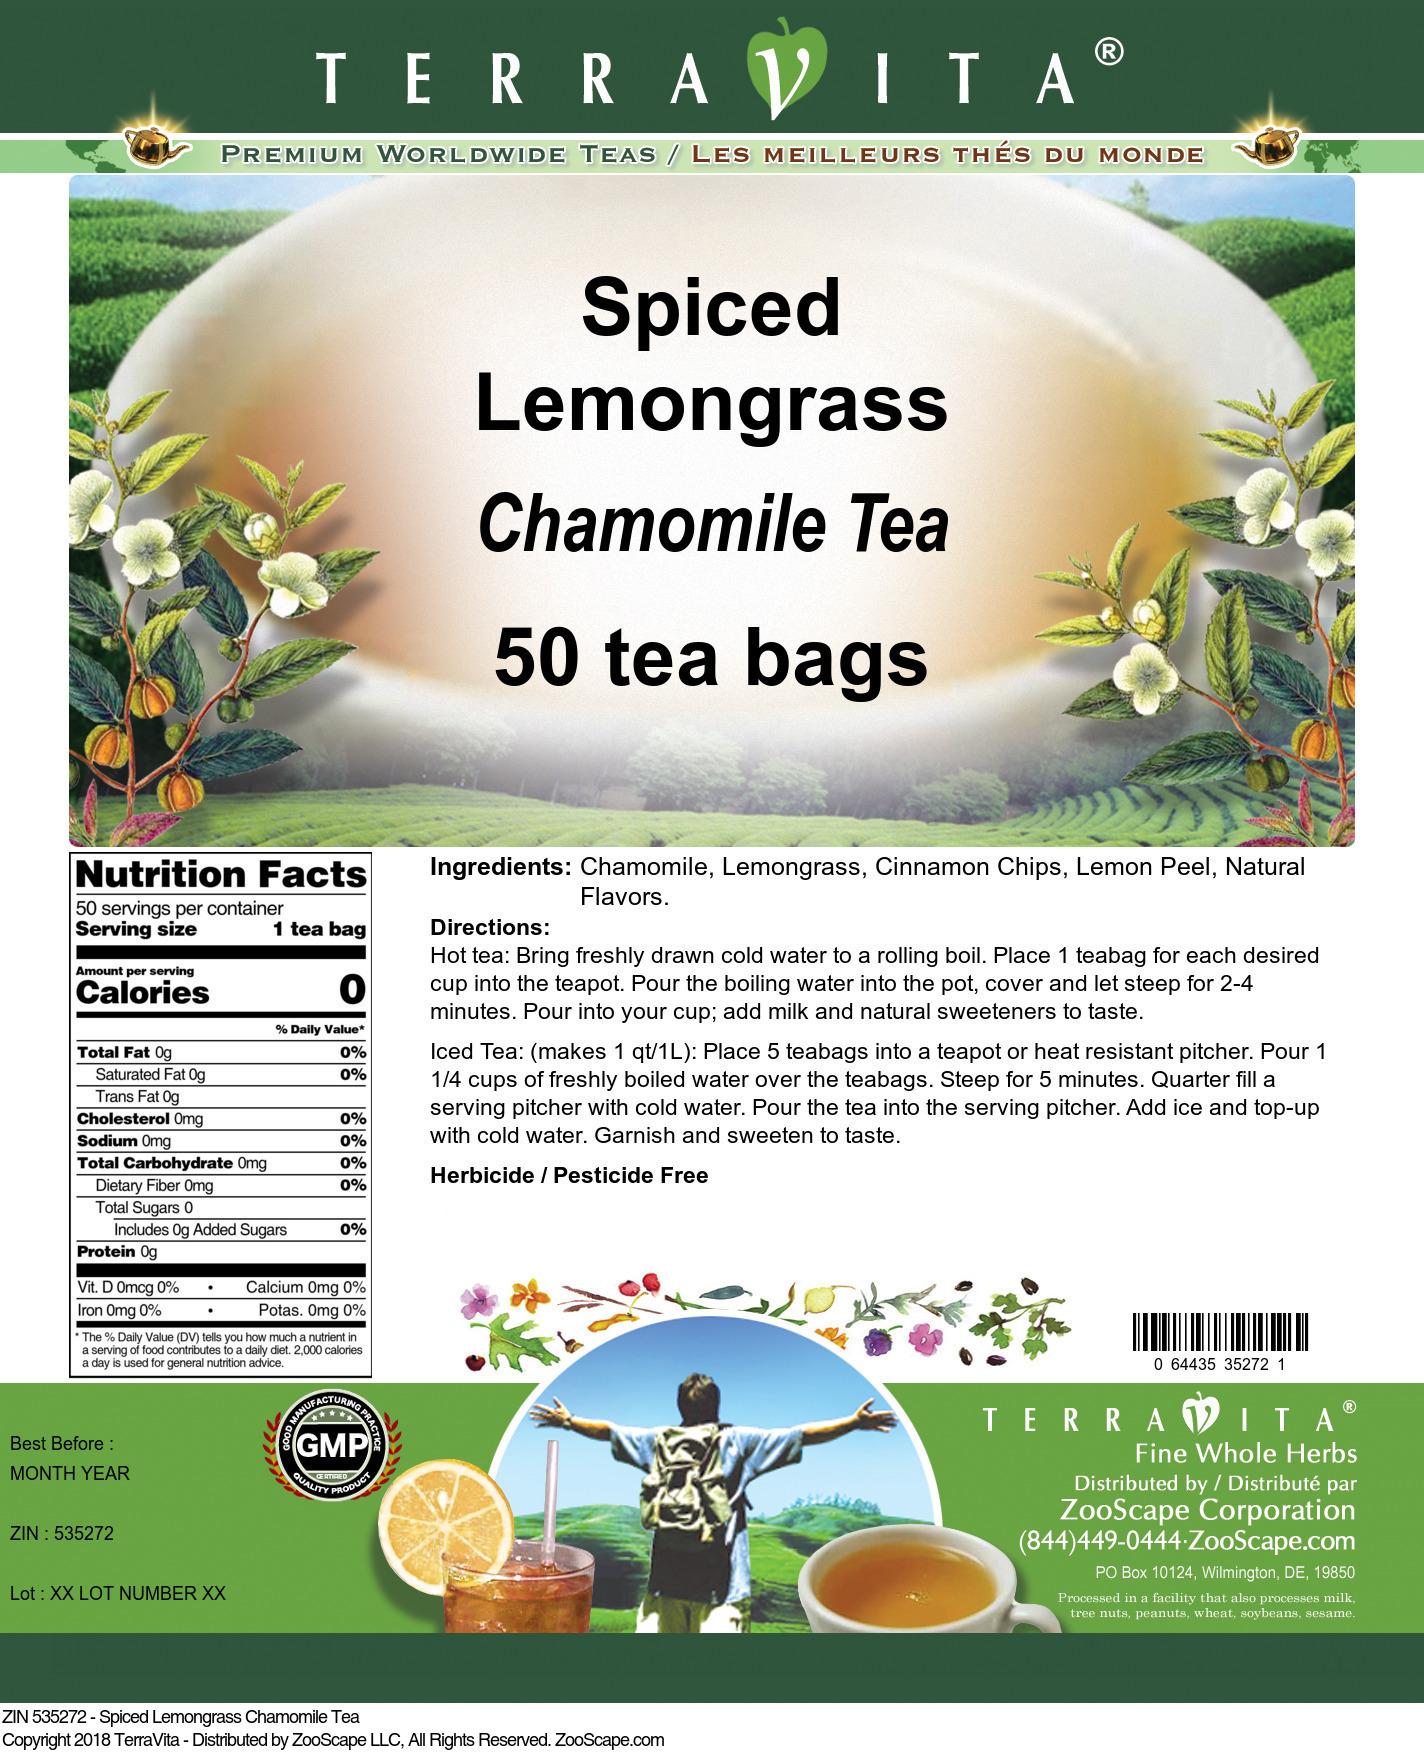 Spiced Lemongrass Chamomile Tea